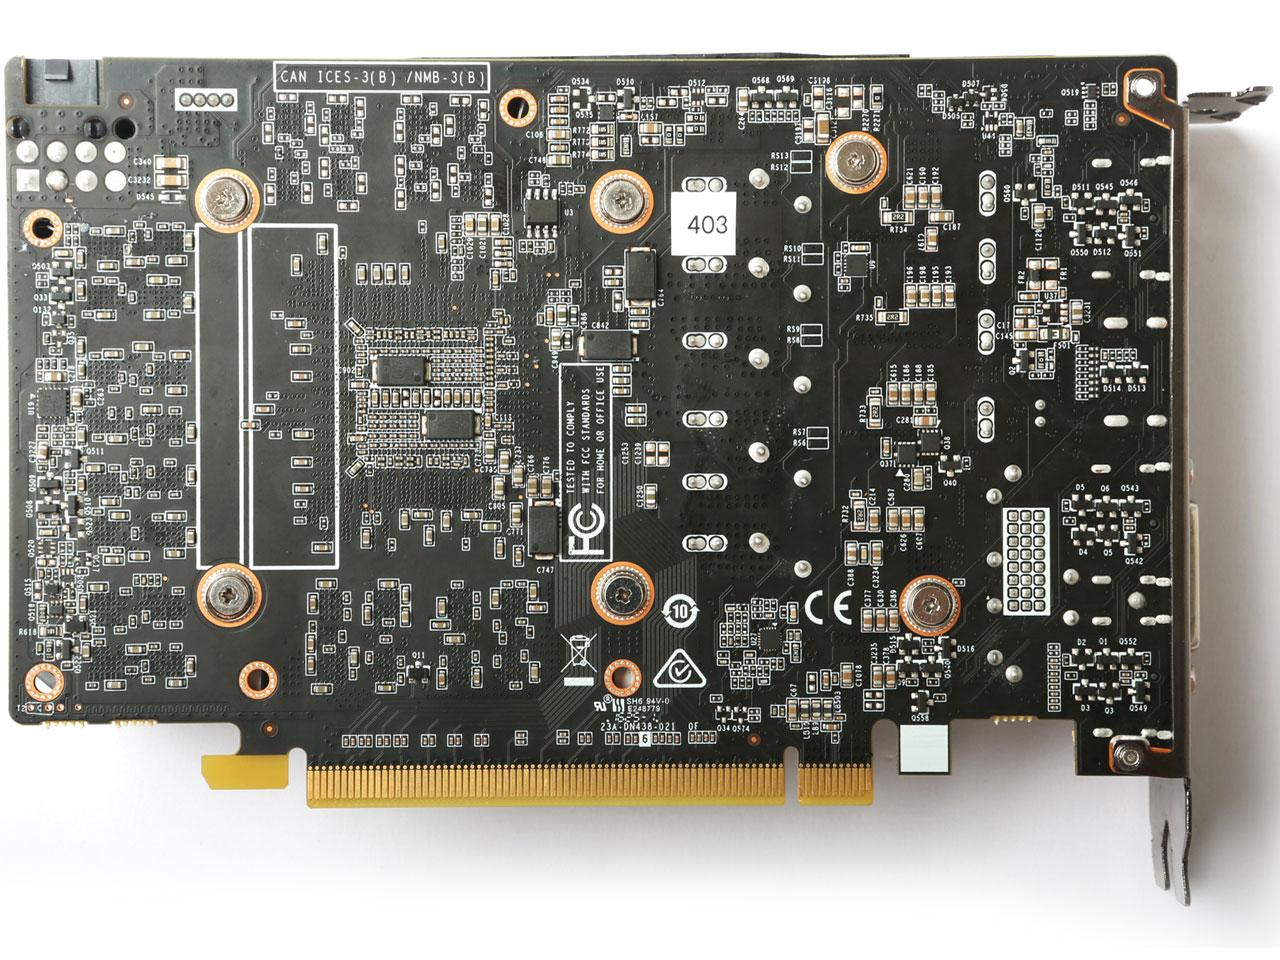 『本体4』 ZOTAC GeForce GTX 1060 6GB Single Fan ZT-P10600A-10L [PCIExp 6GB] の製品画像